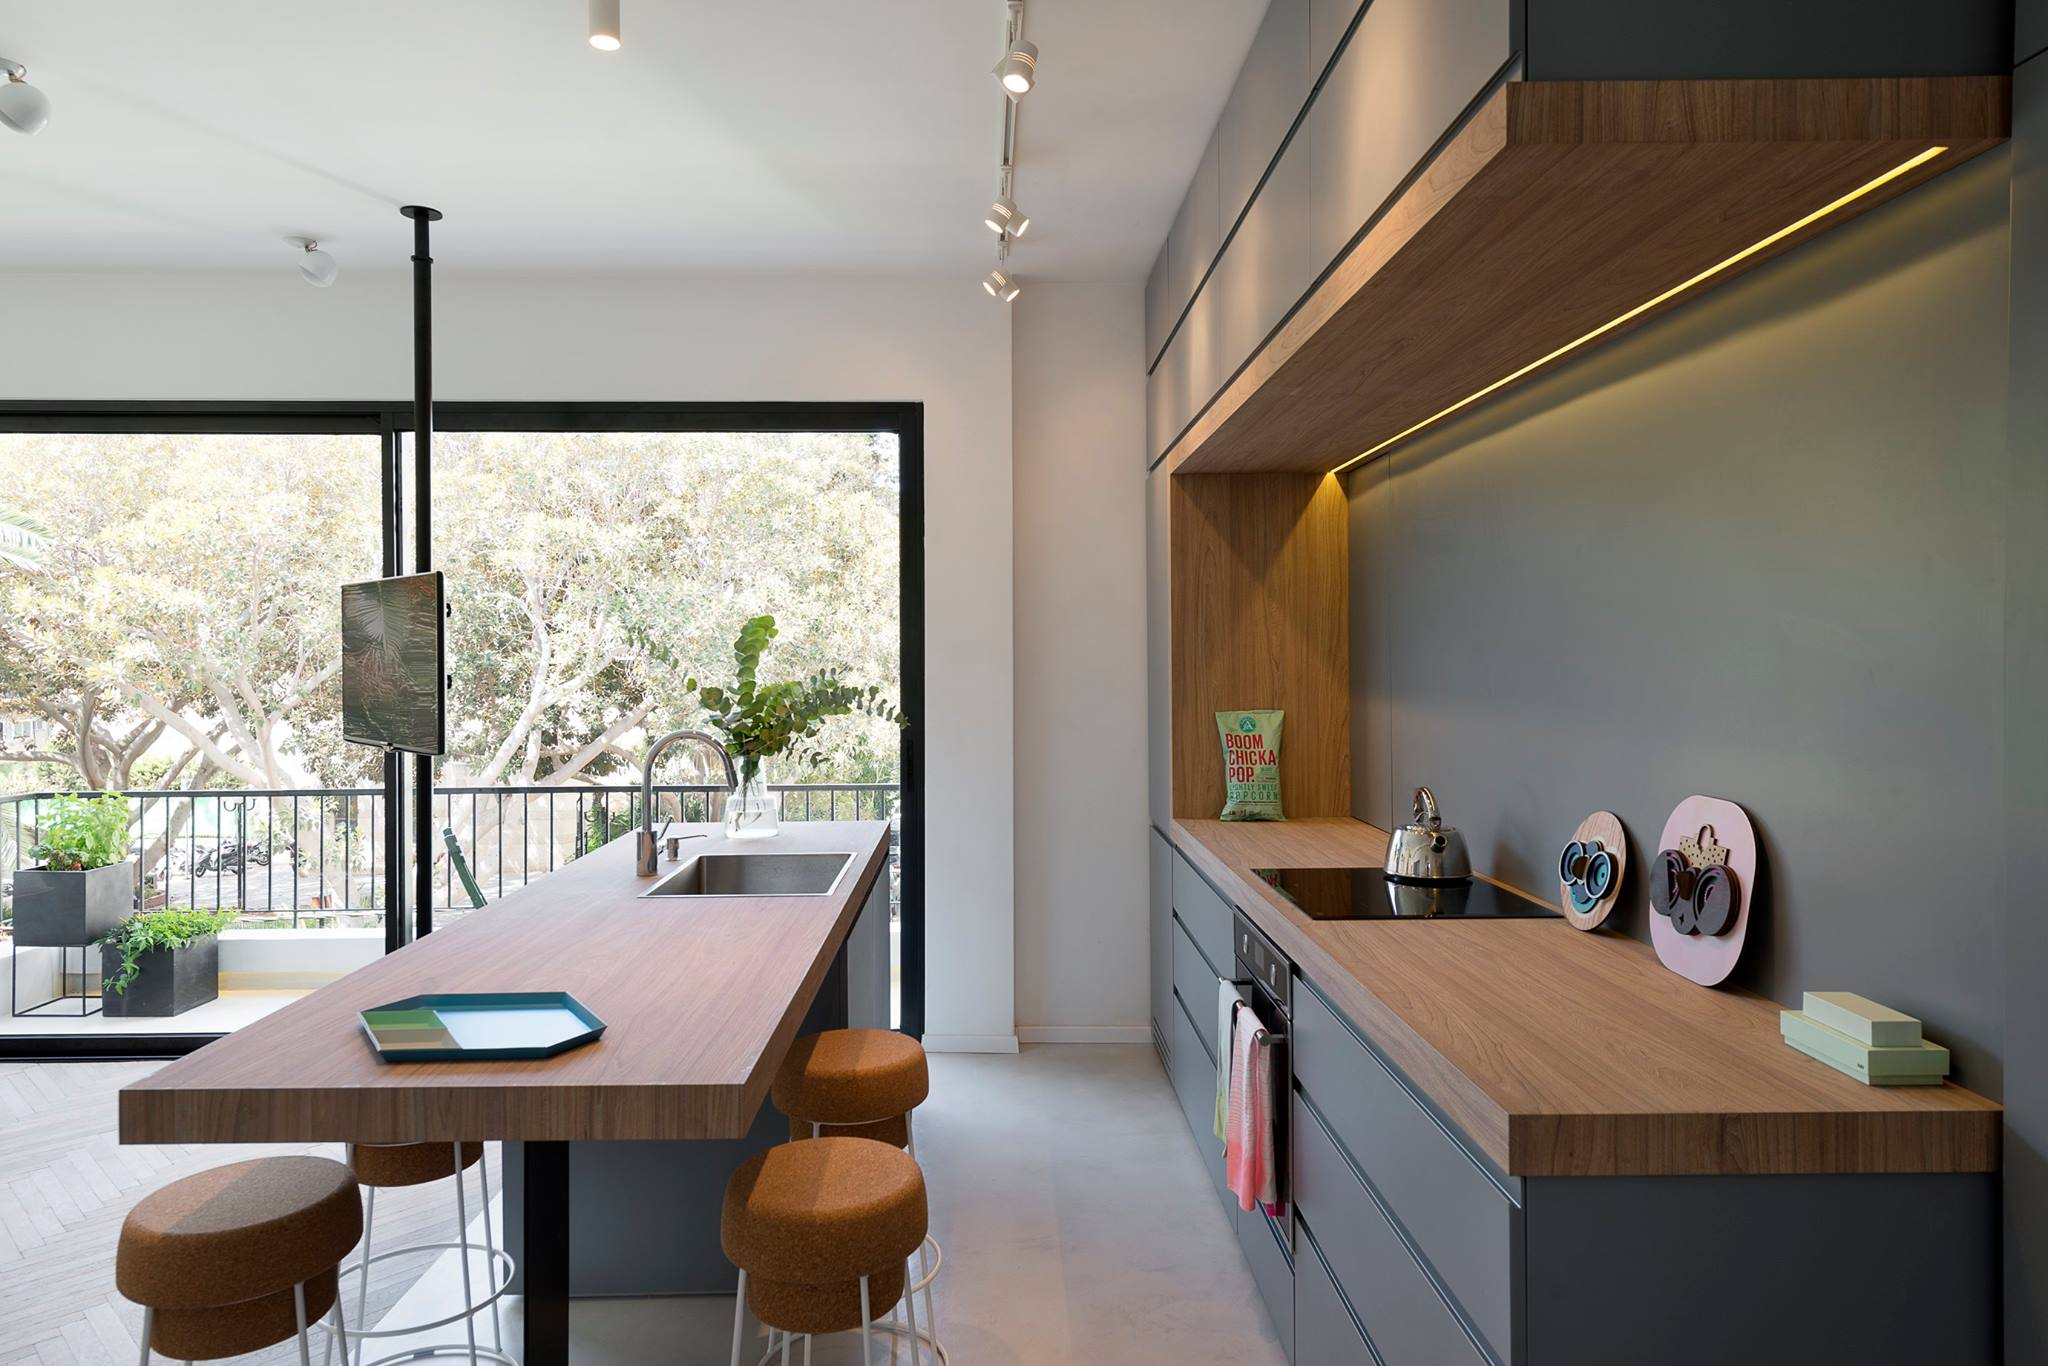 35 ispirazioni per una arredare la cucina a vista living for Cucina living